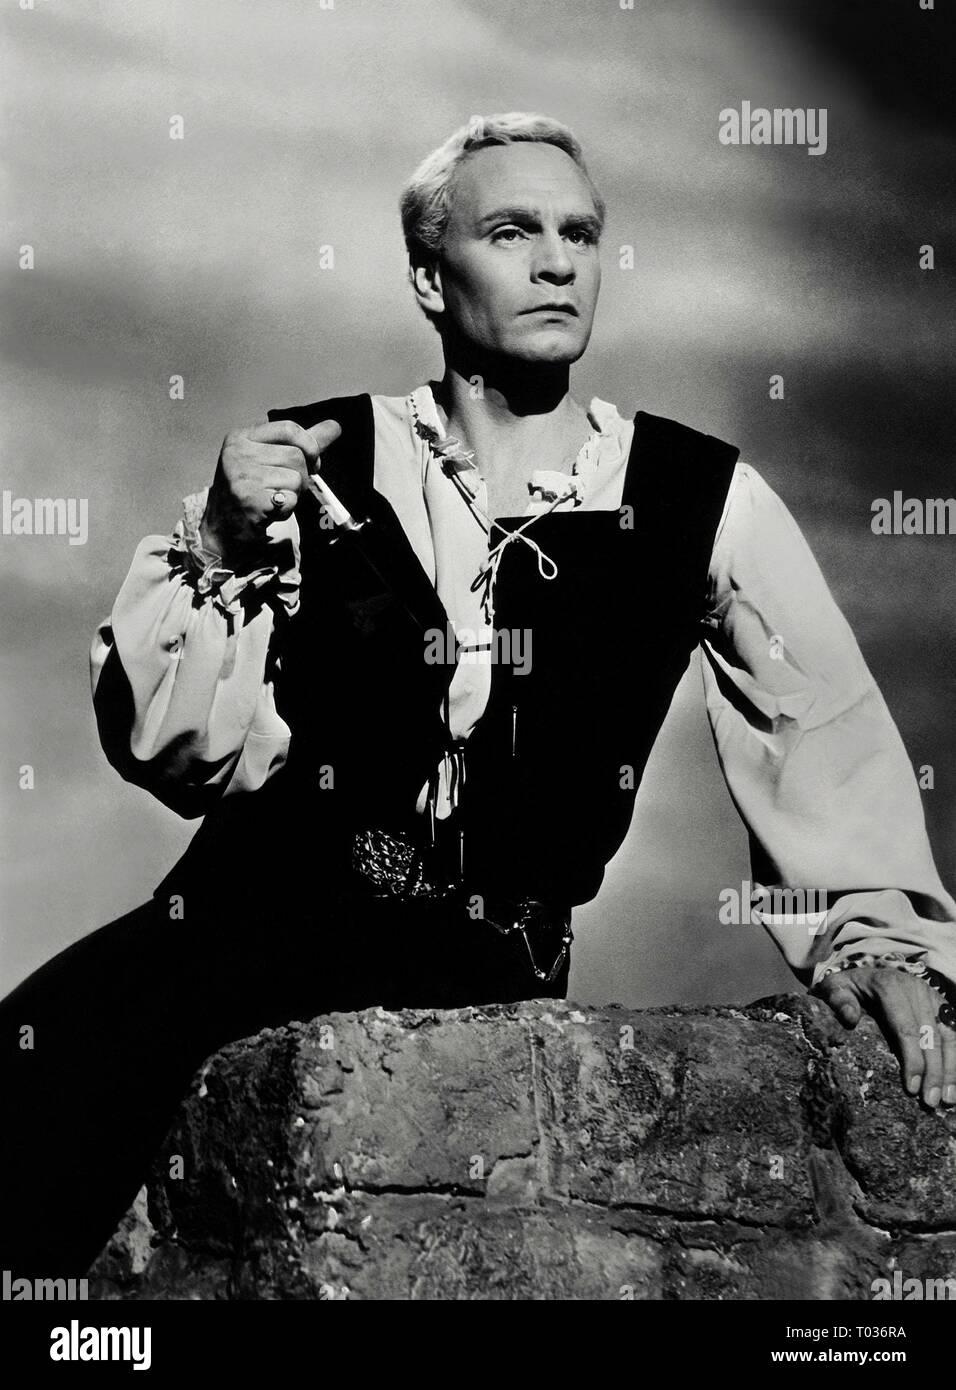 LAURENCE OLIVIER, HAMLET, 1948 - Stock Image